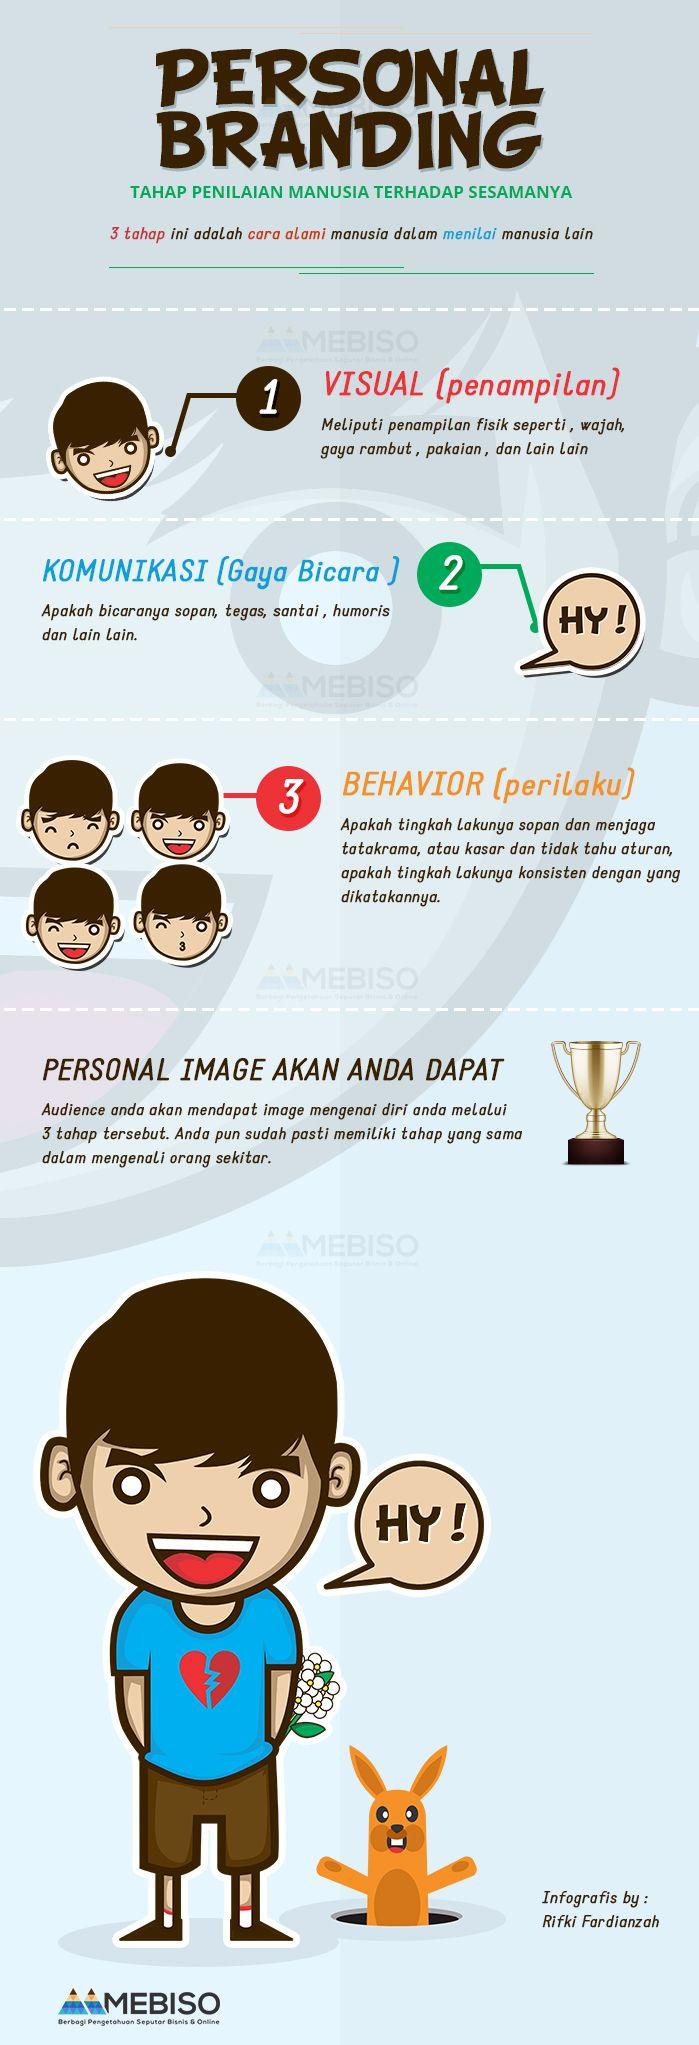 [Infografis] Personal Branding, Tahap Penilaian Manusia Terhadap Sesamanya